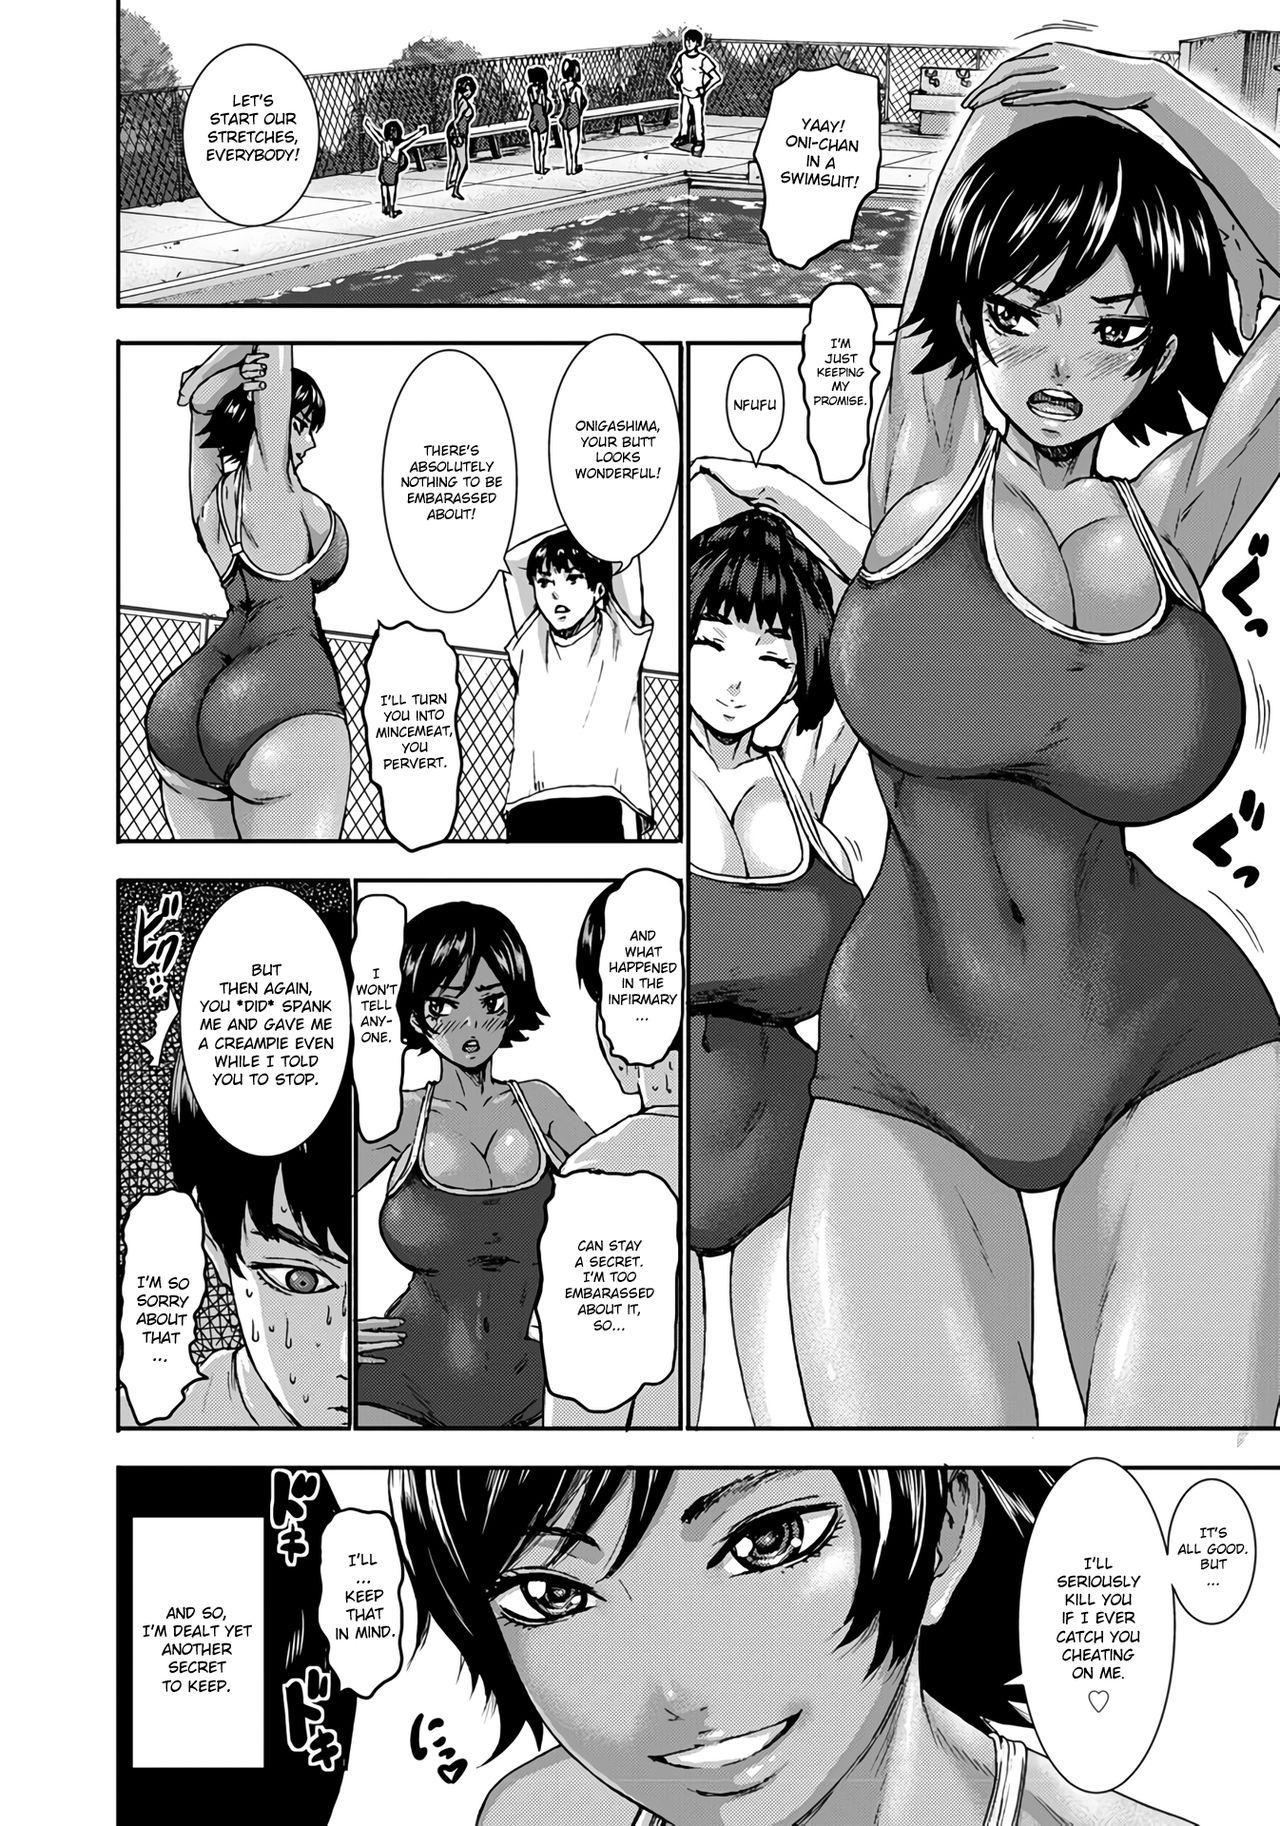 Chounyuu Gakuen | Academy For Huge Breasts 47